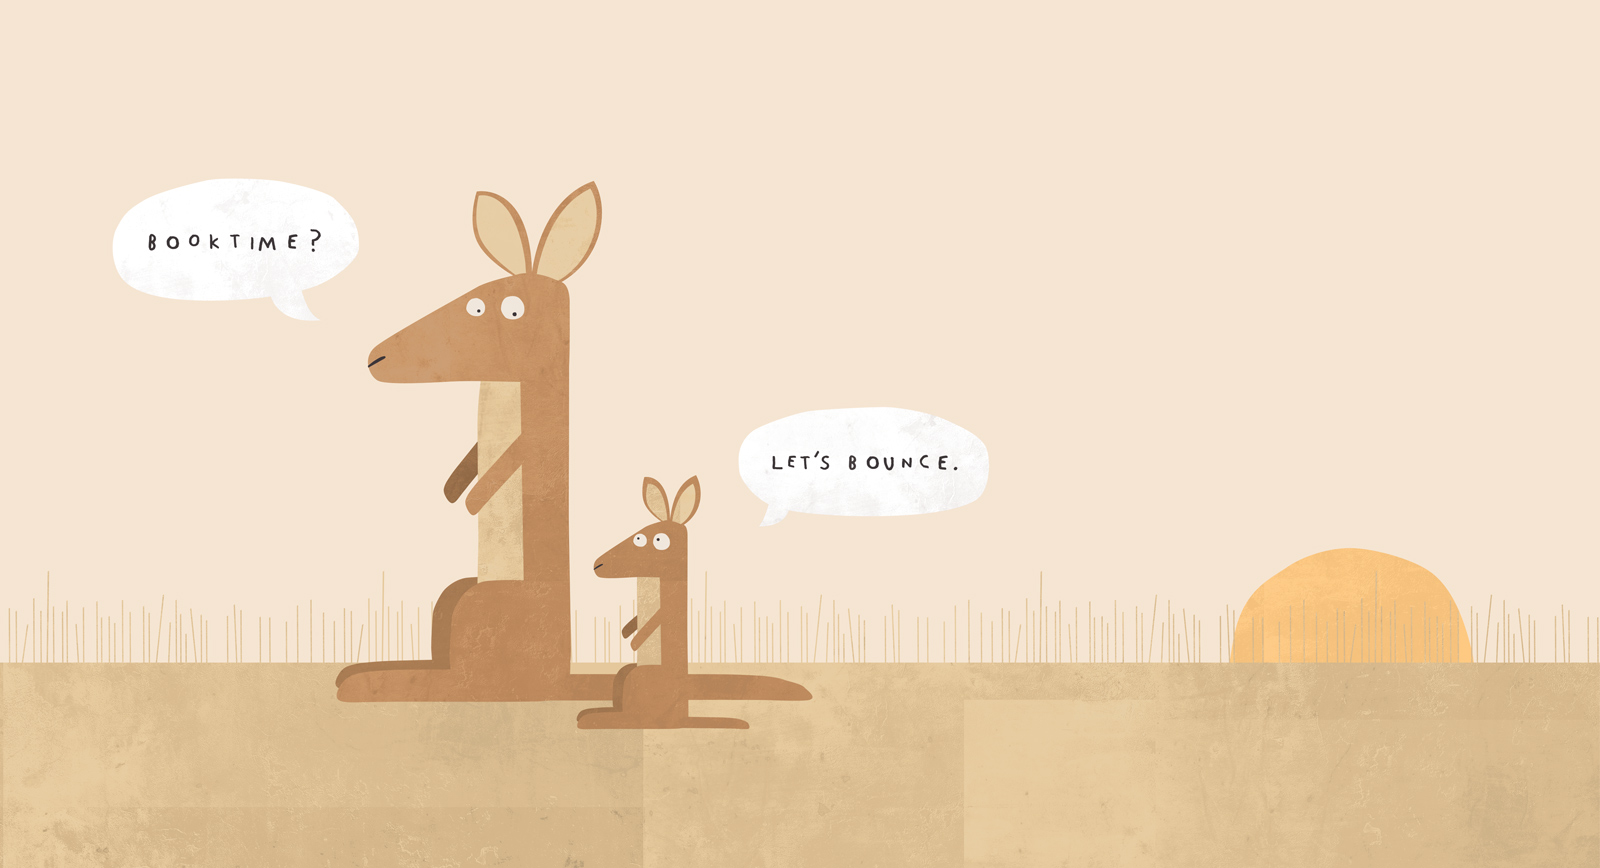 Philip Bunting Kangaroos —Let's bounce